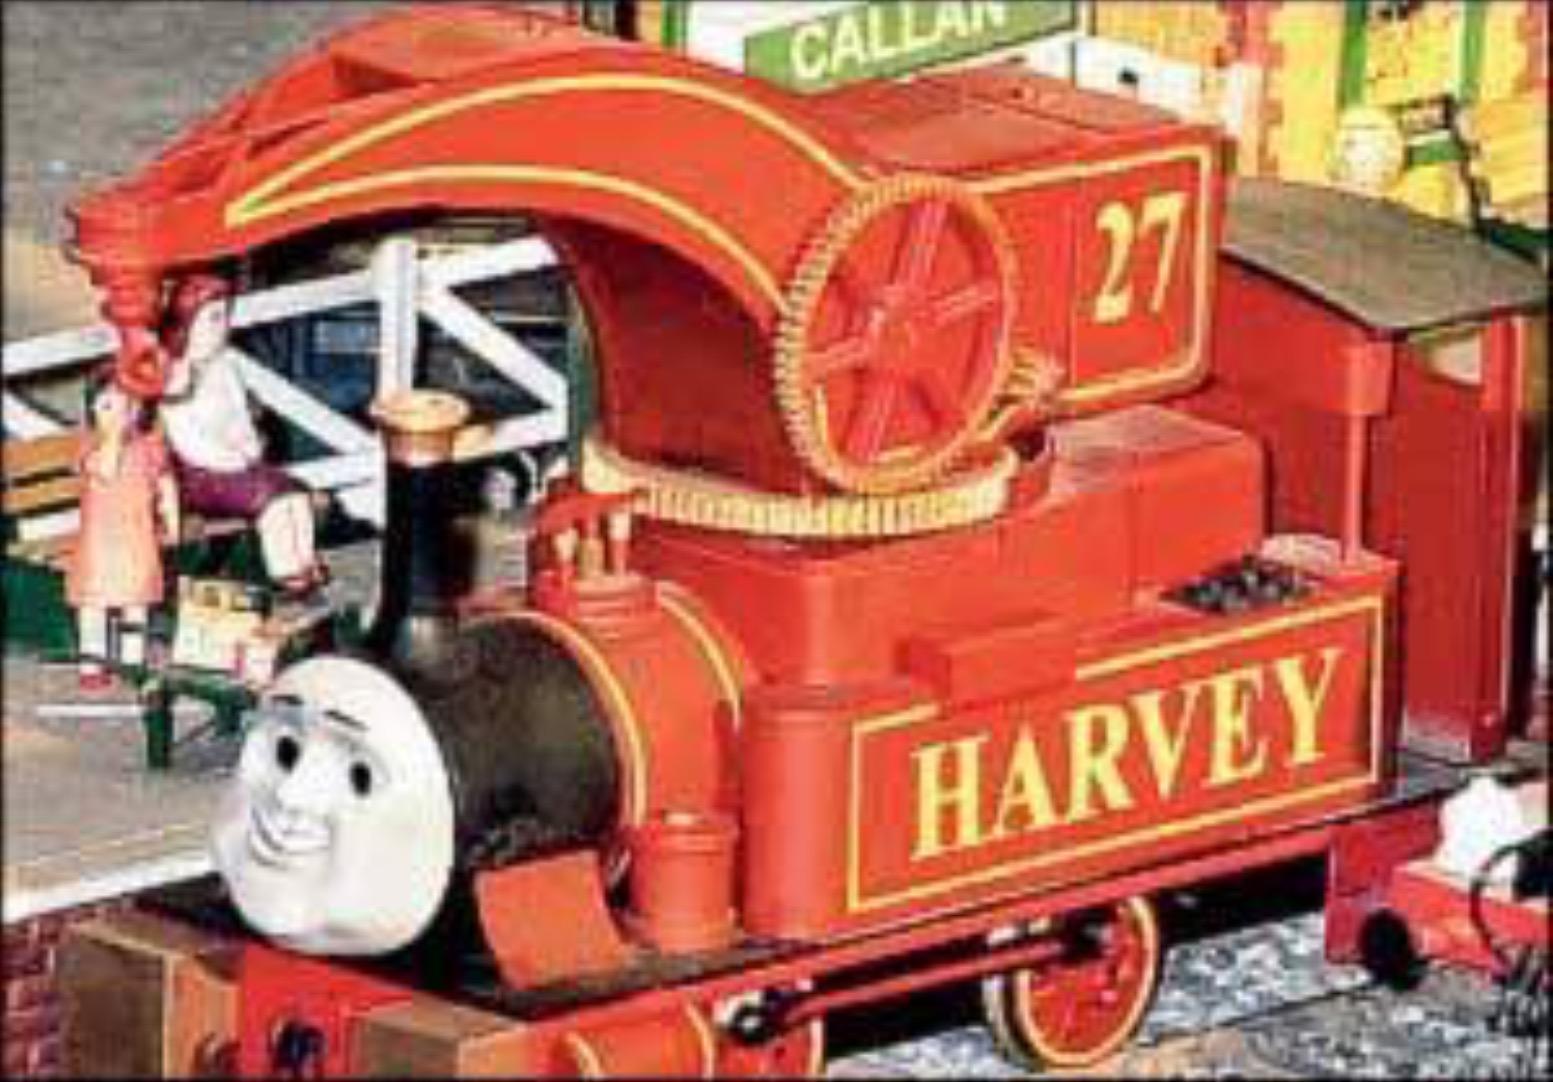 File:HarveySeason6Model.jpg